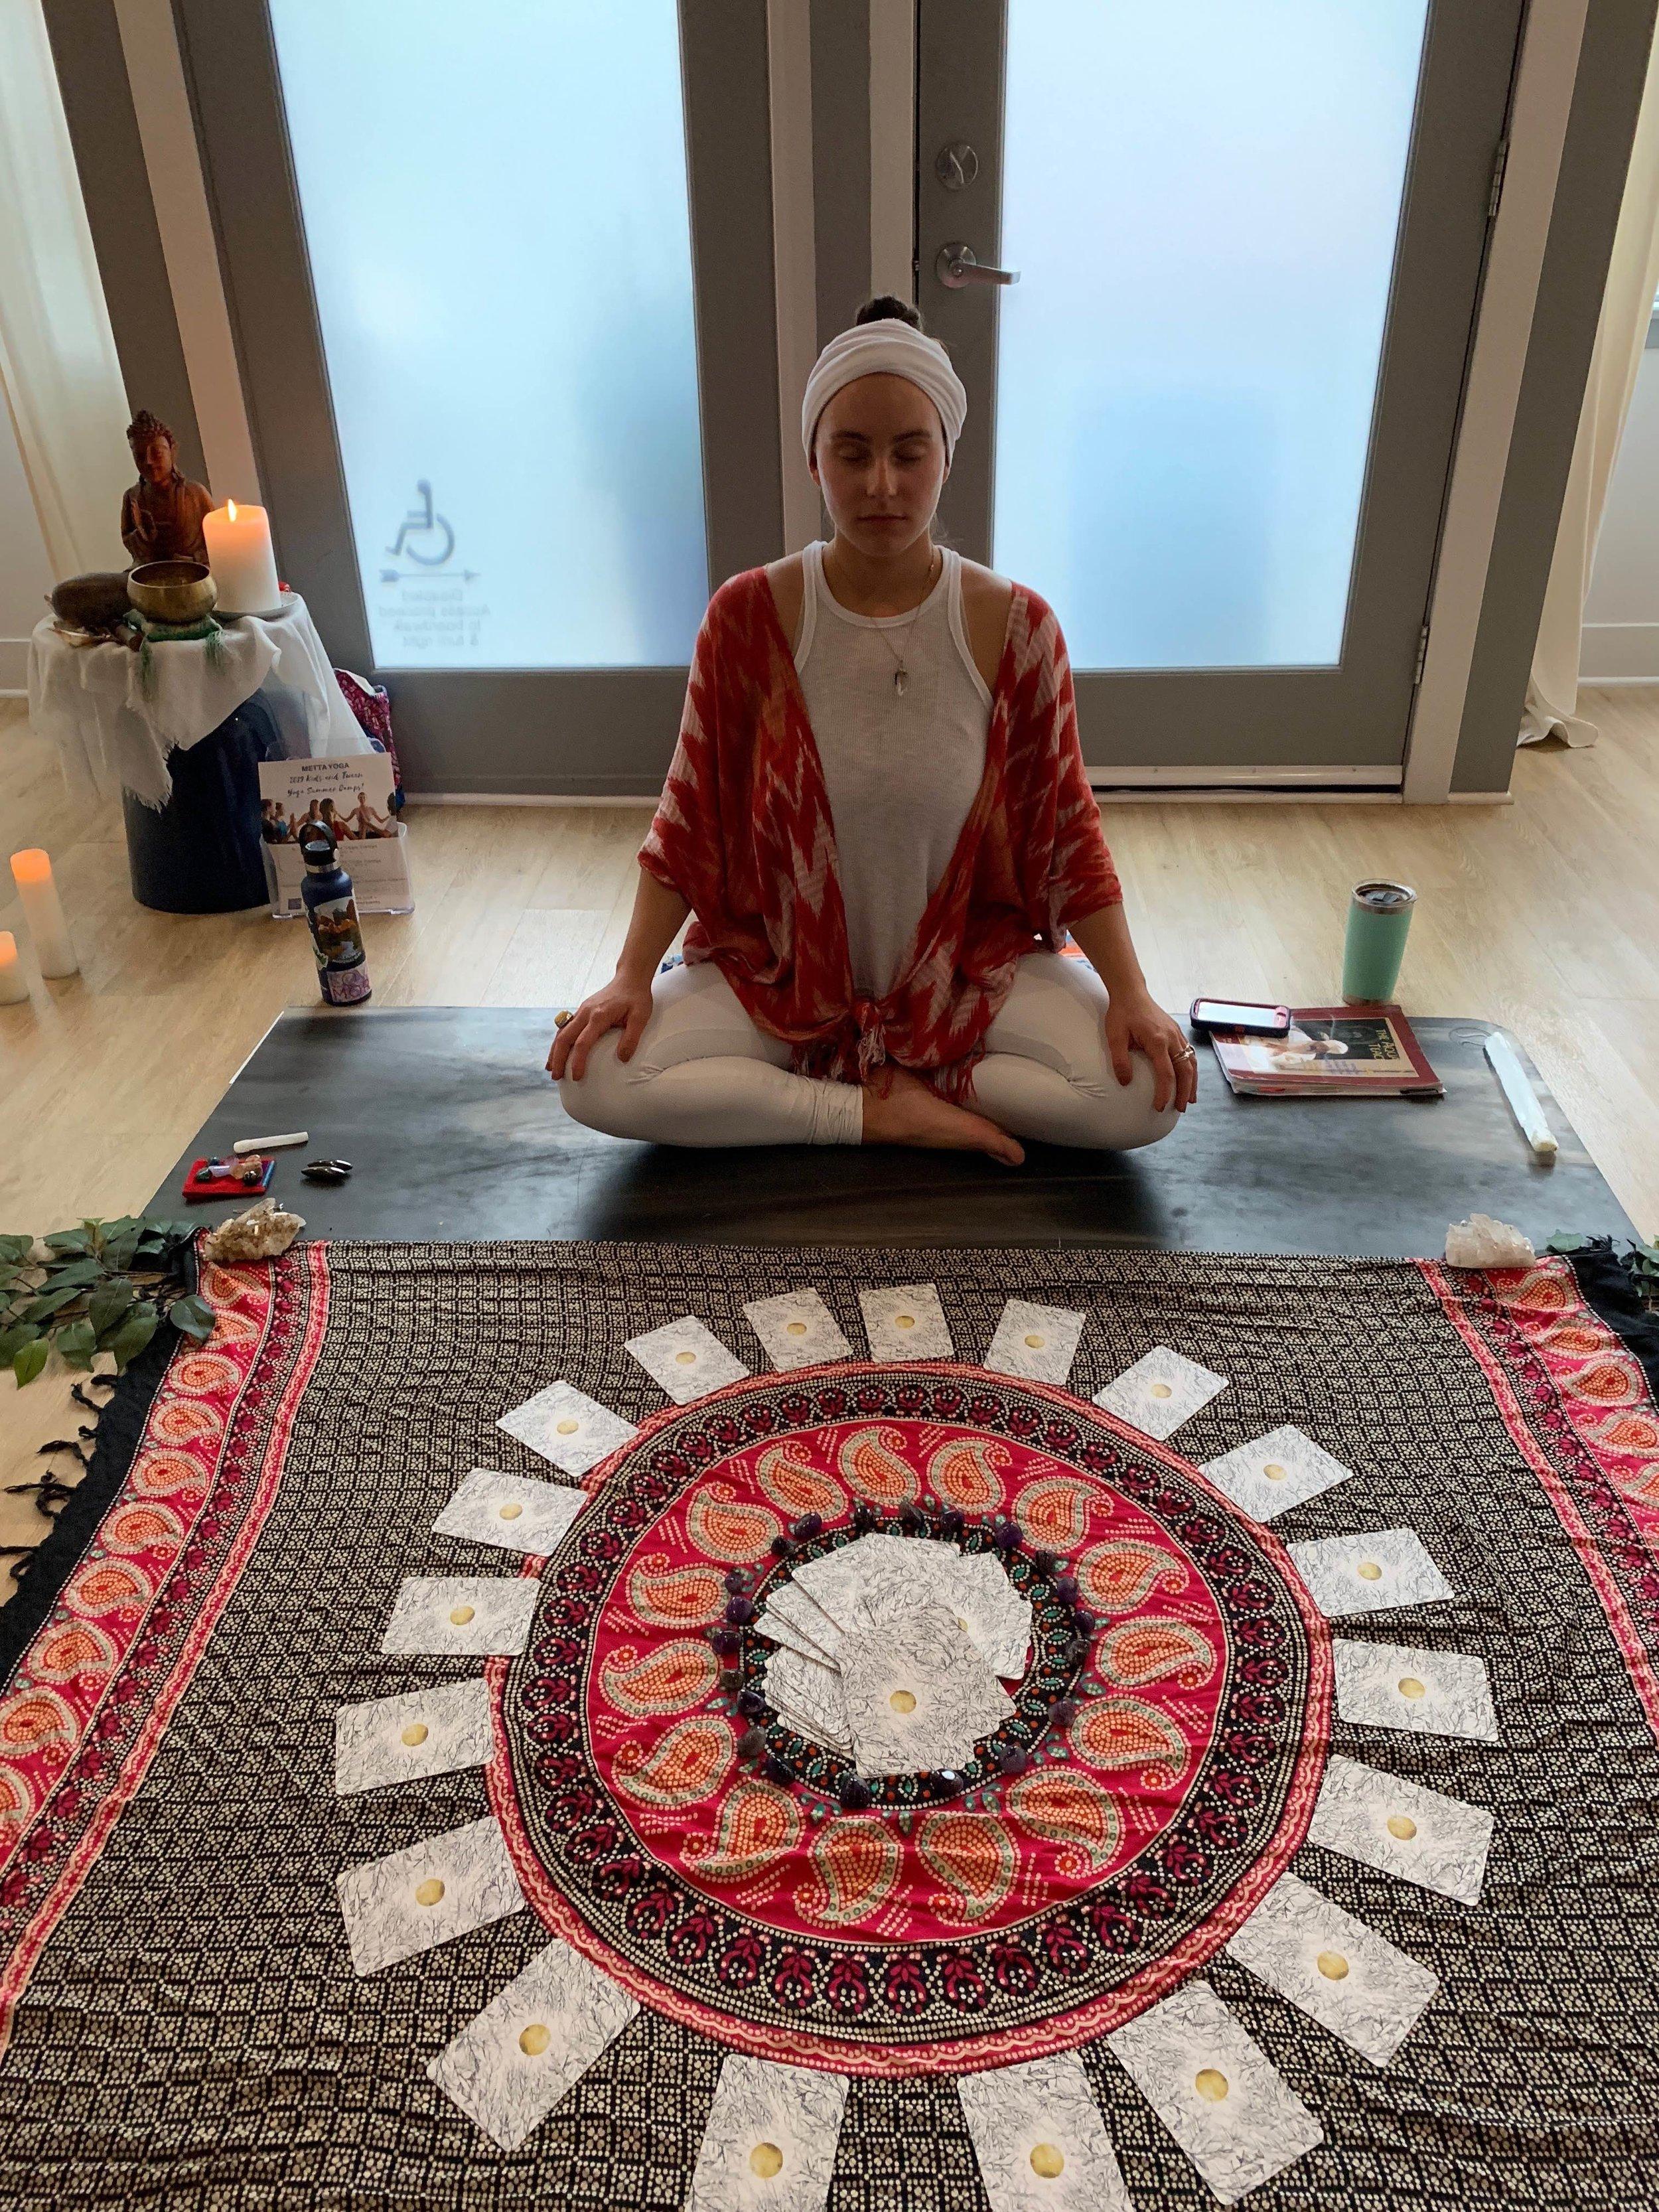 kundalini yoga, kundalini meditation, crystal healing, tarot cards, kundalini yoga marin